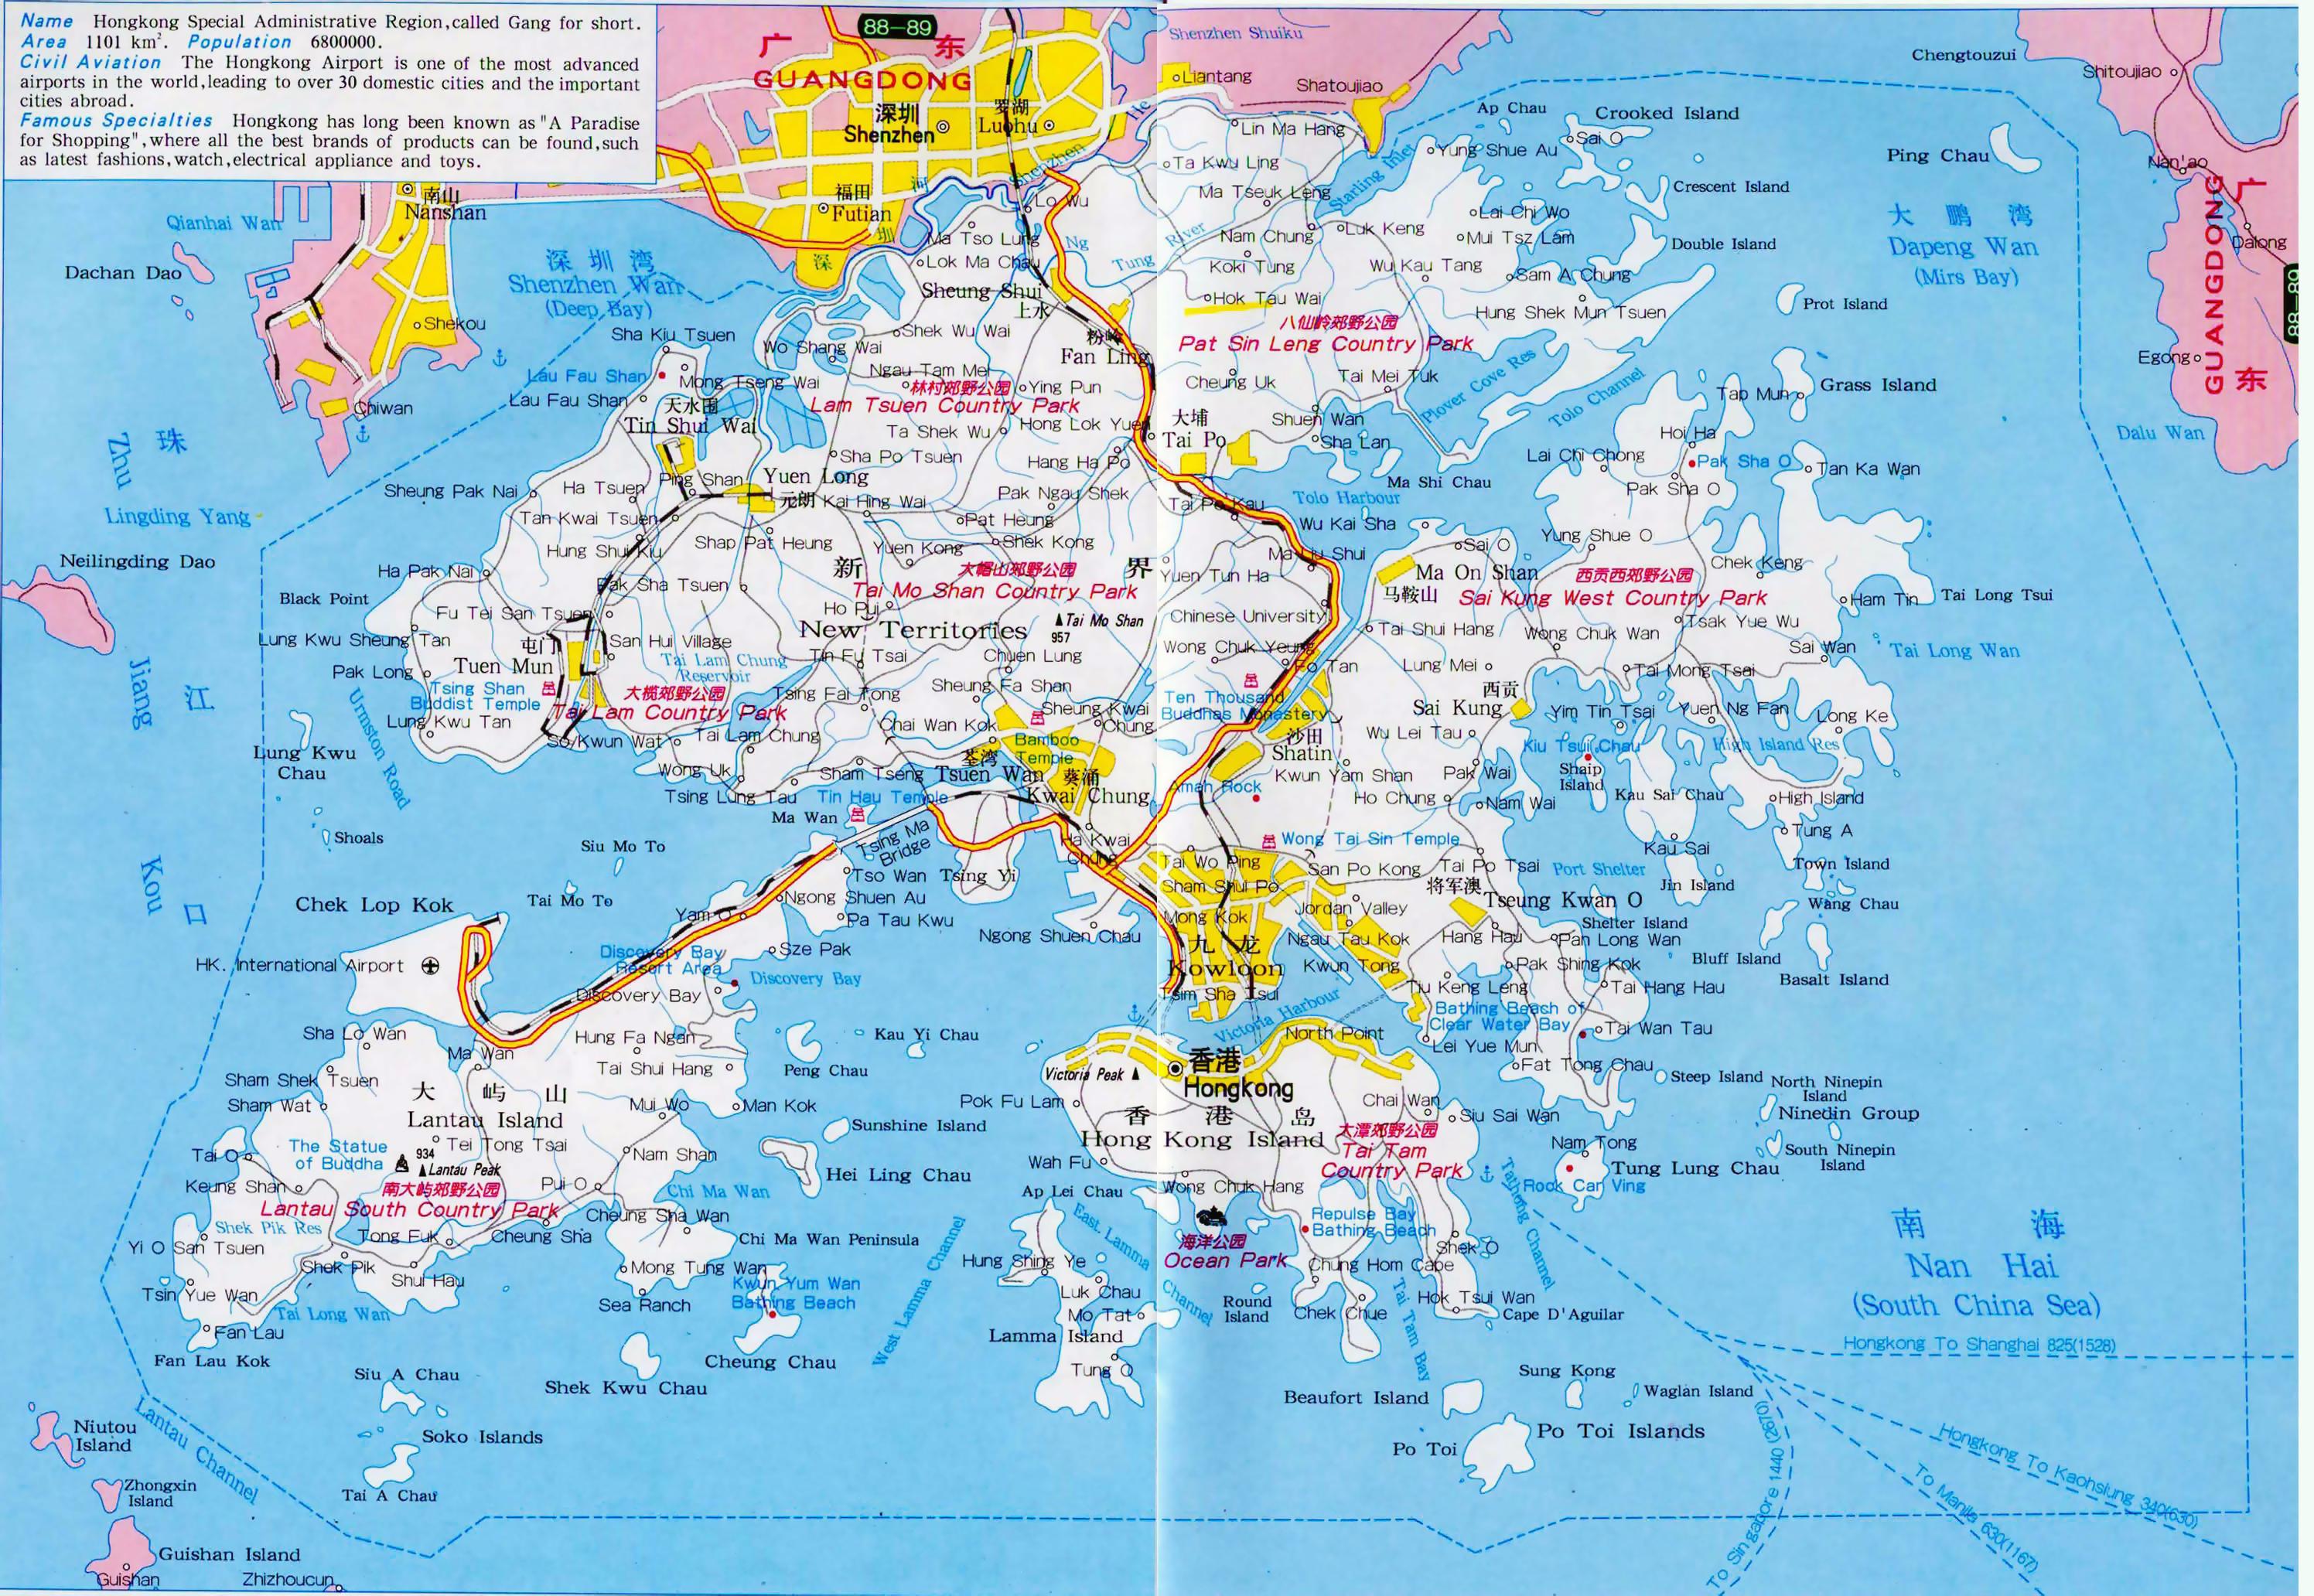 Map Of Asia Hong Kong.Large Detailed Road Map Of Hong Kong Hong Kong Asia Mapsland